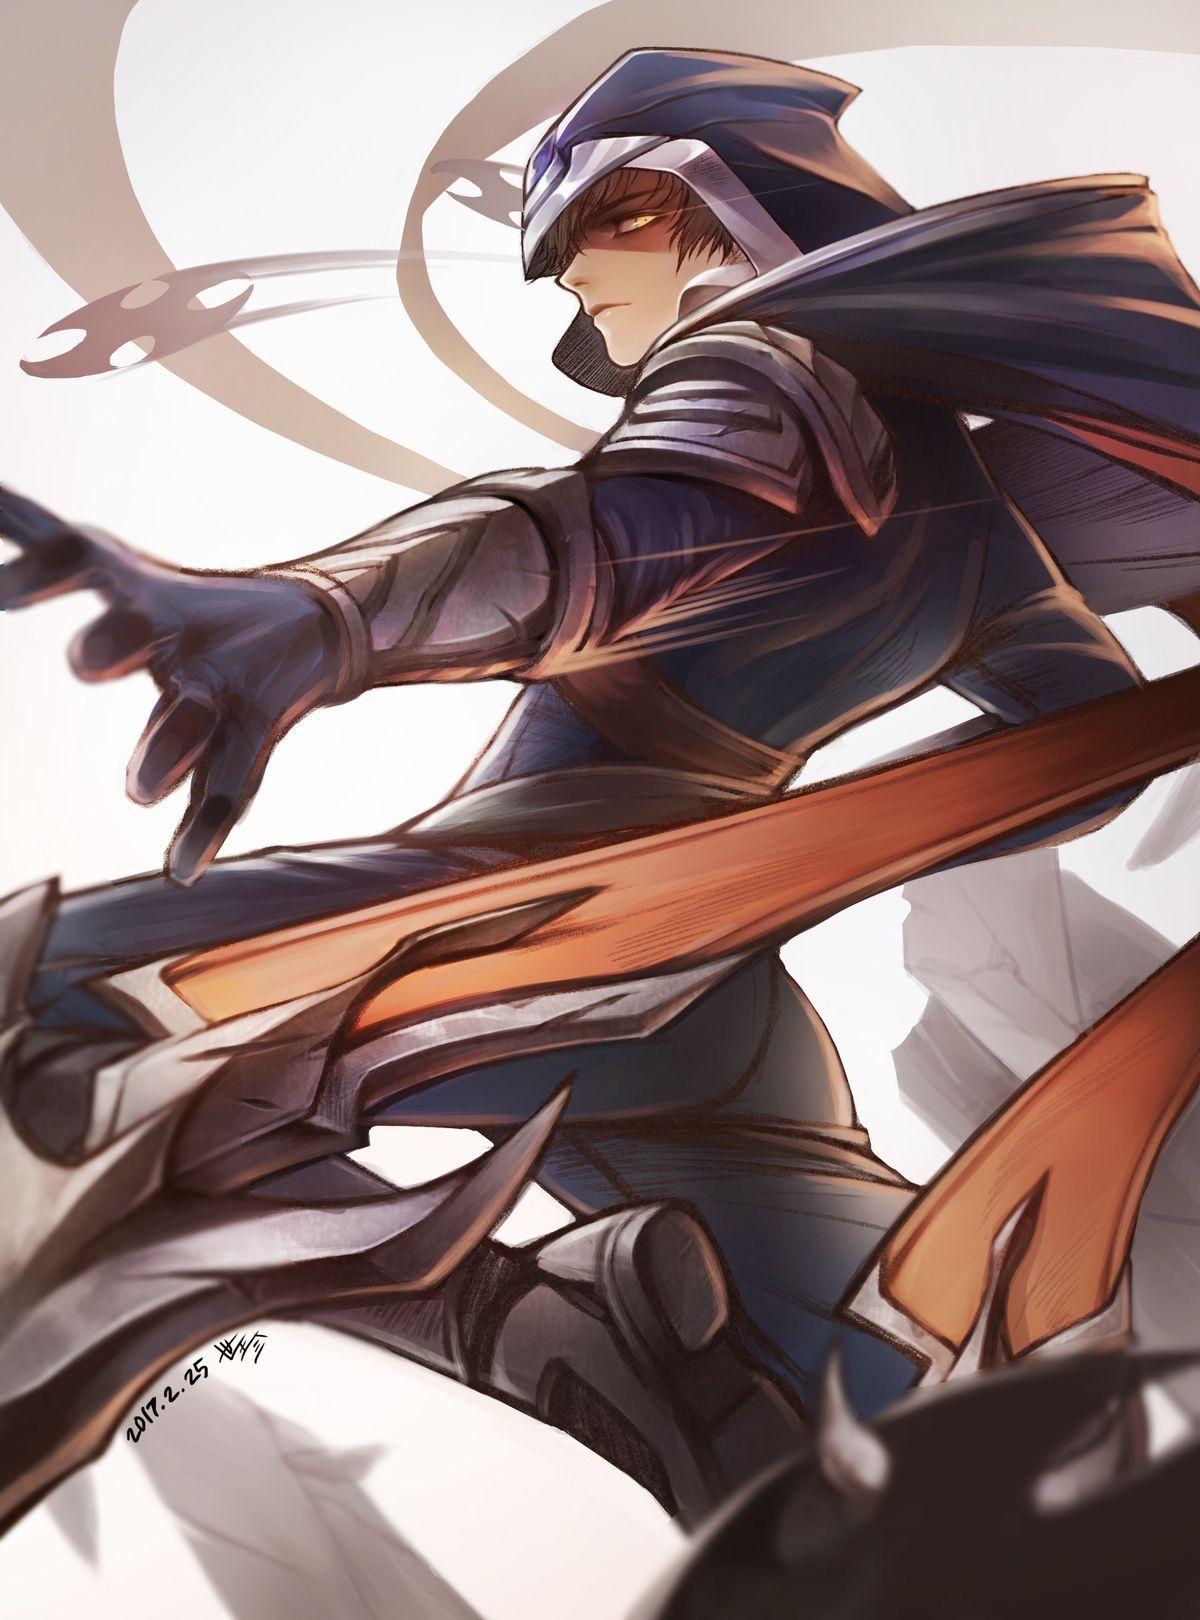 f3e515009 Hayabusa League Of Legends Talon, League Of Legends Boards, Legend Quotes,  Assassin's Creed